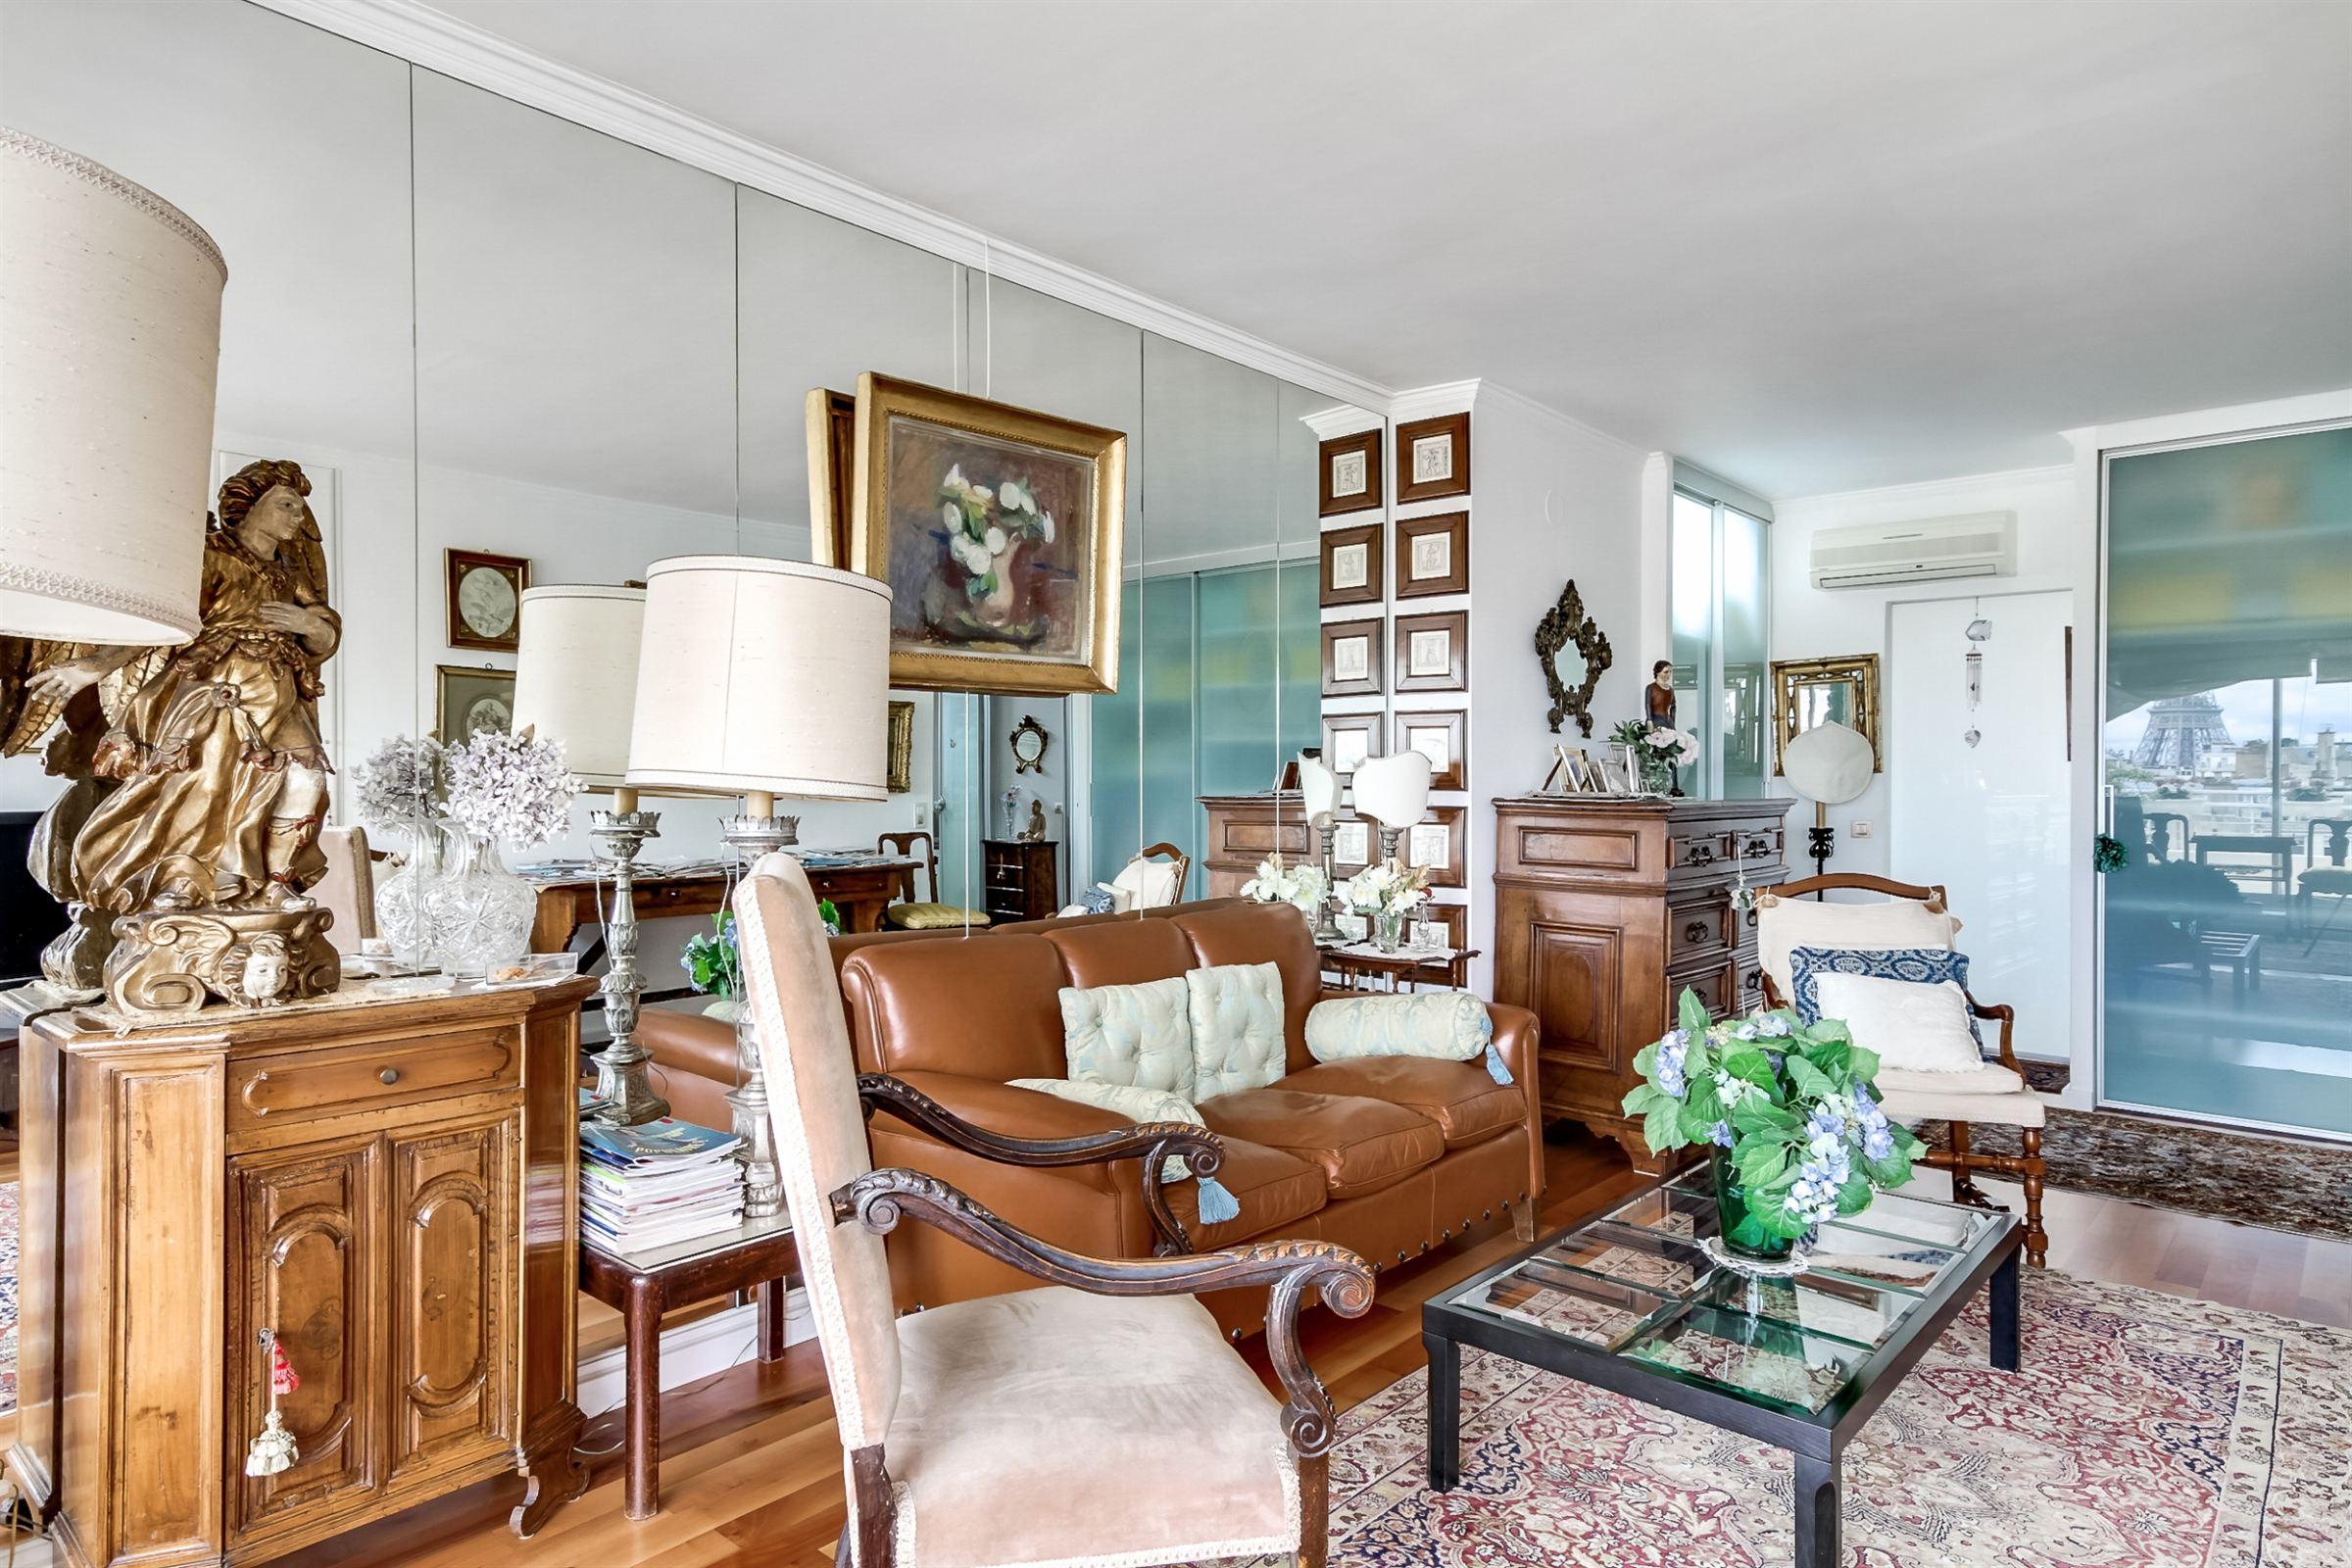 Property For Sale at Paris 16 - Muette. 80 sq.m. apartment. 25 sq.m. terrace, Eiffel Tower view